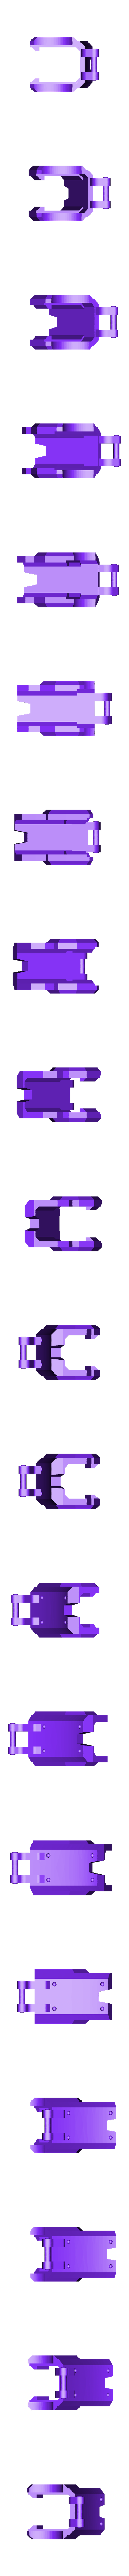 LegT1_Right_10_OliveGreen.stl Download STL file Heavy Gun Walker • 3D print design, Jwoong